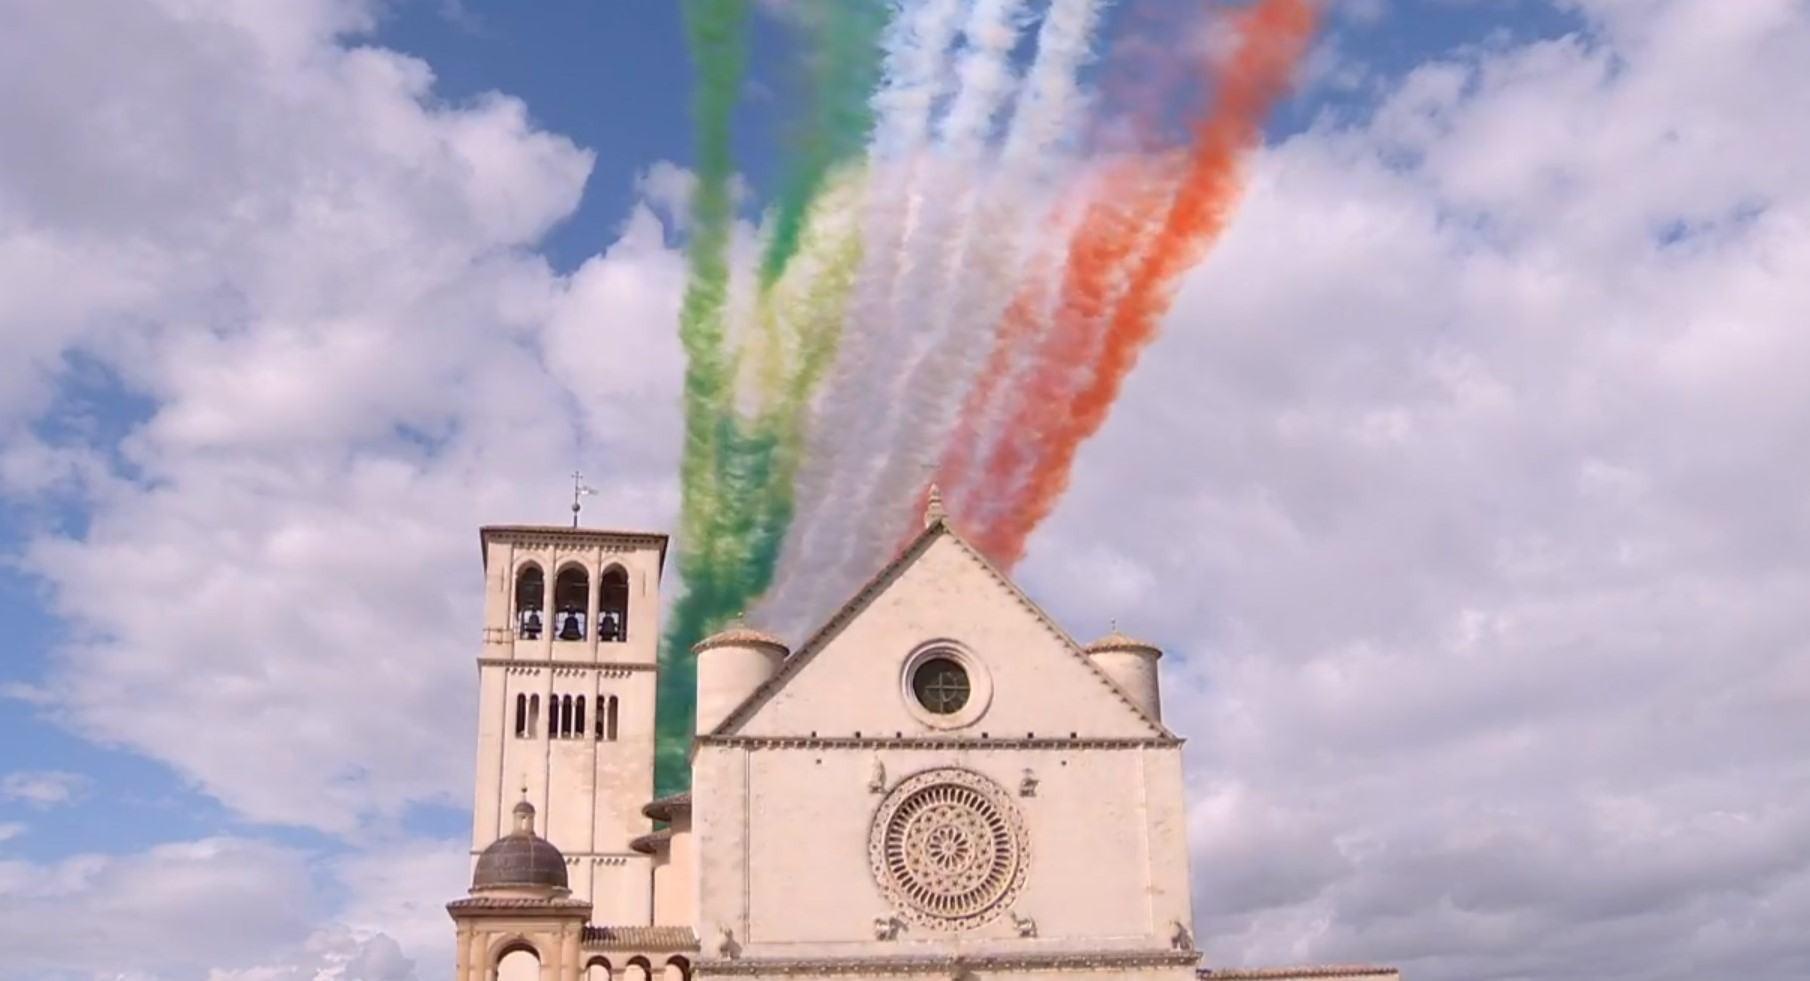 fresse-tricolori-assisi-6.jpg